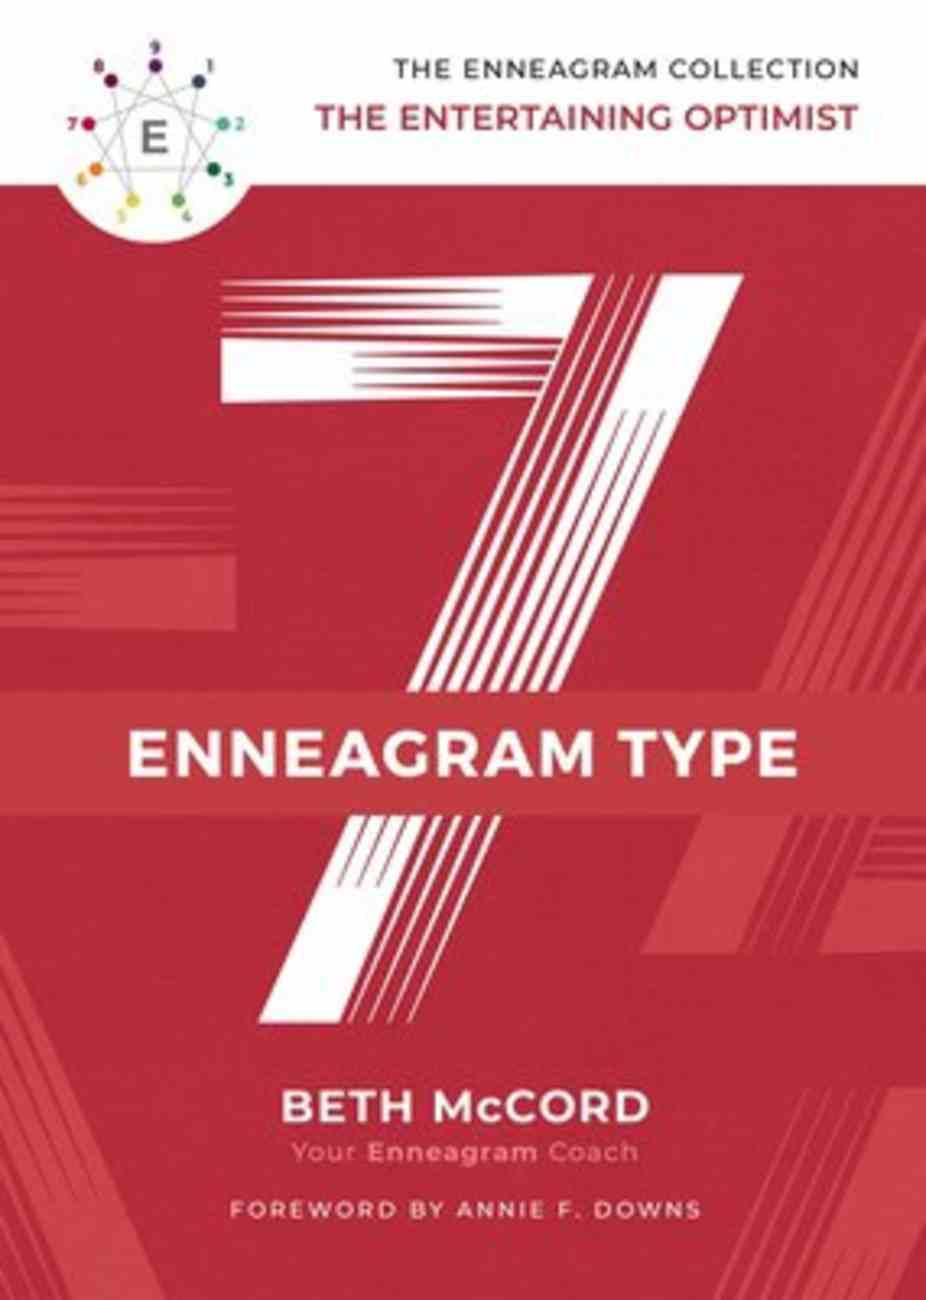 The Enneagram Type 7 (Enneagram Collection) eBook